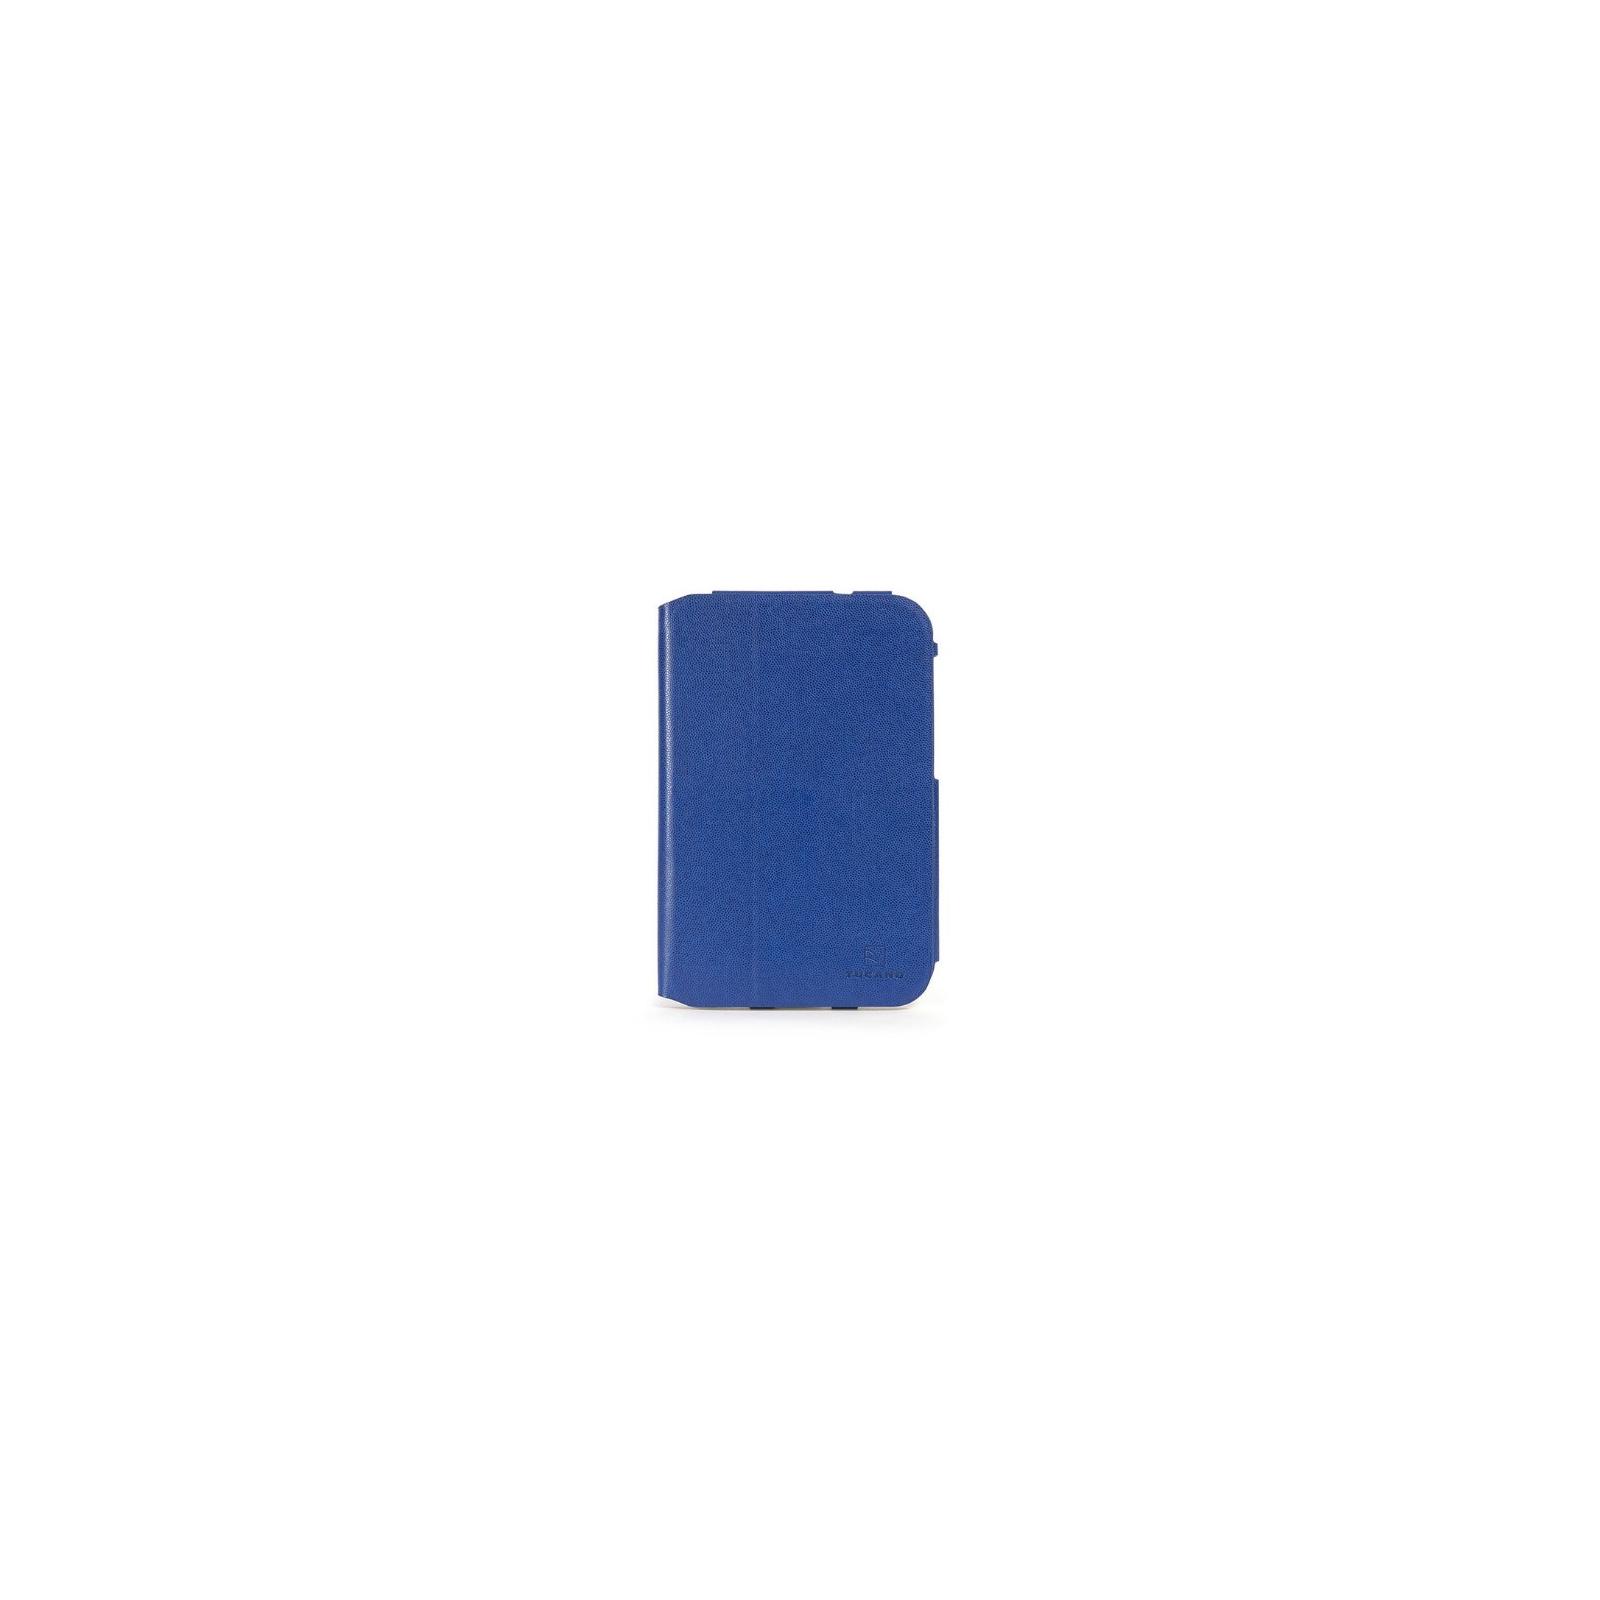 Чехол для планшета Tucano Galaxy Tab 3 8.0 Leggero Blue (TAB-LS38-B)